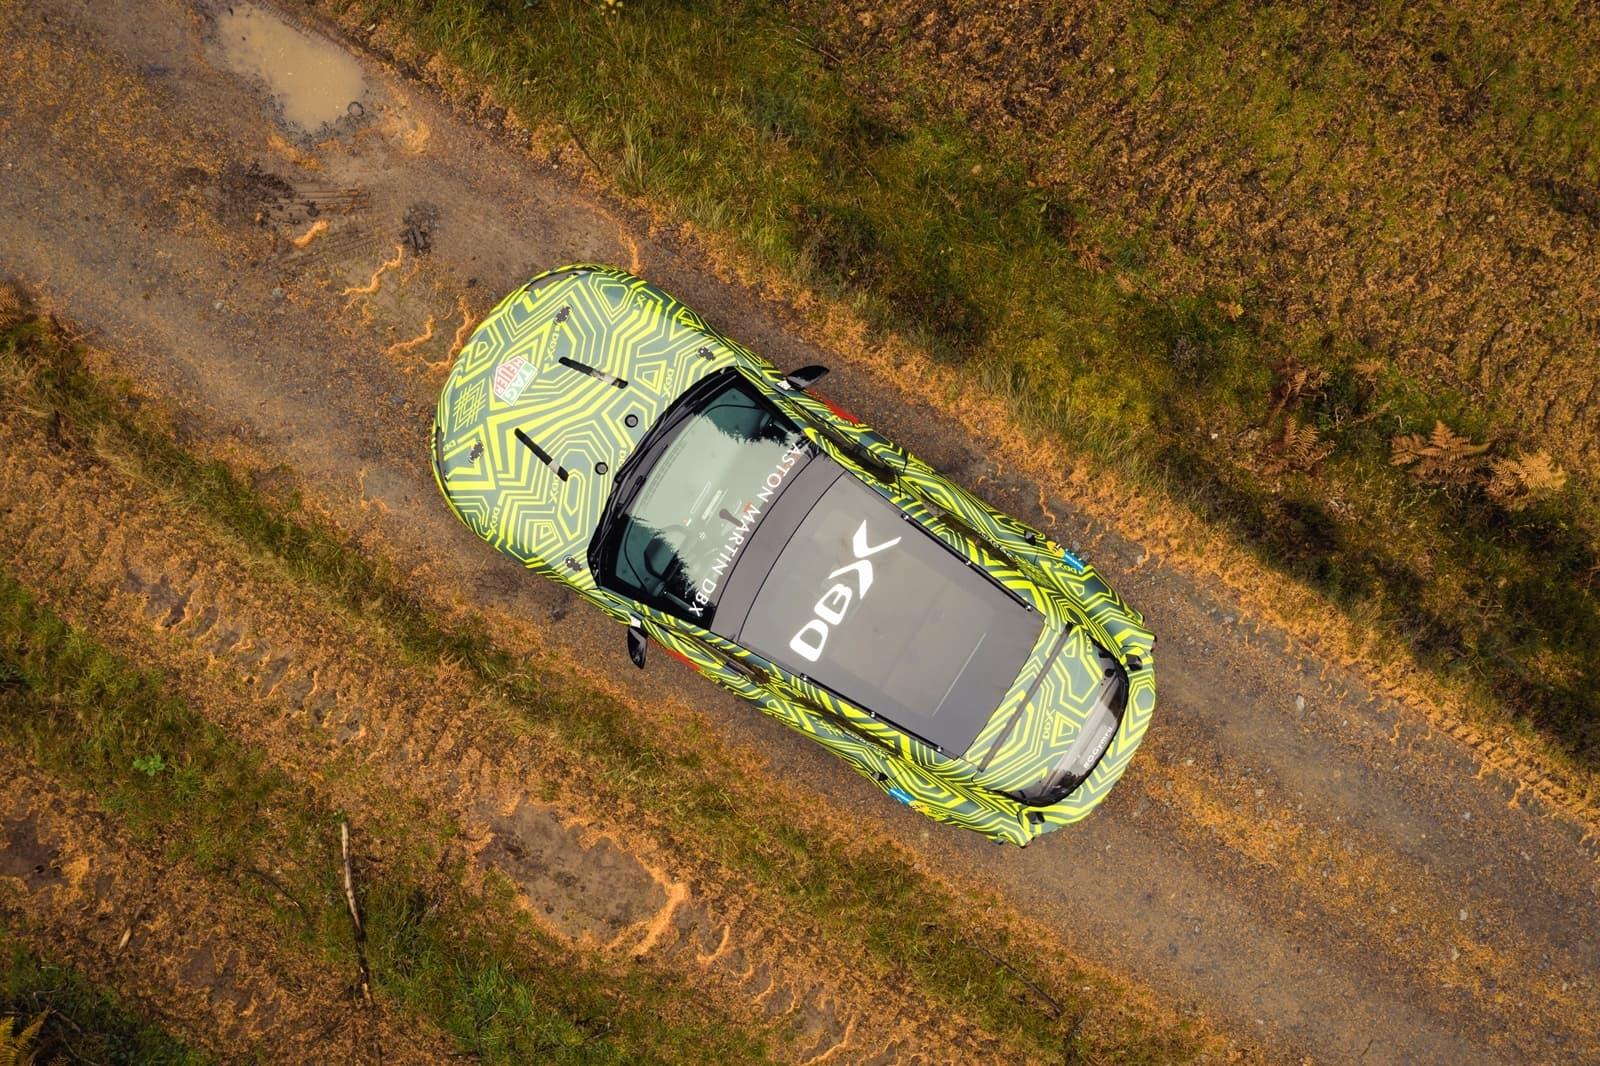 Aston Martin 5th / 6th November 2018 Photo: Sam Riley